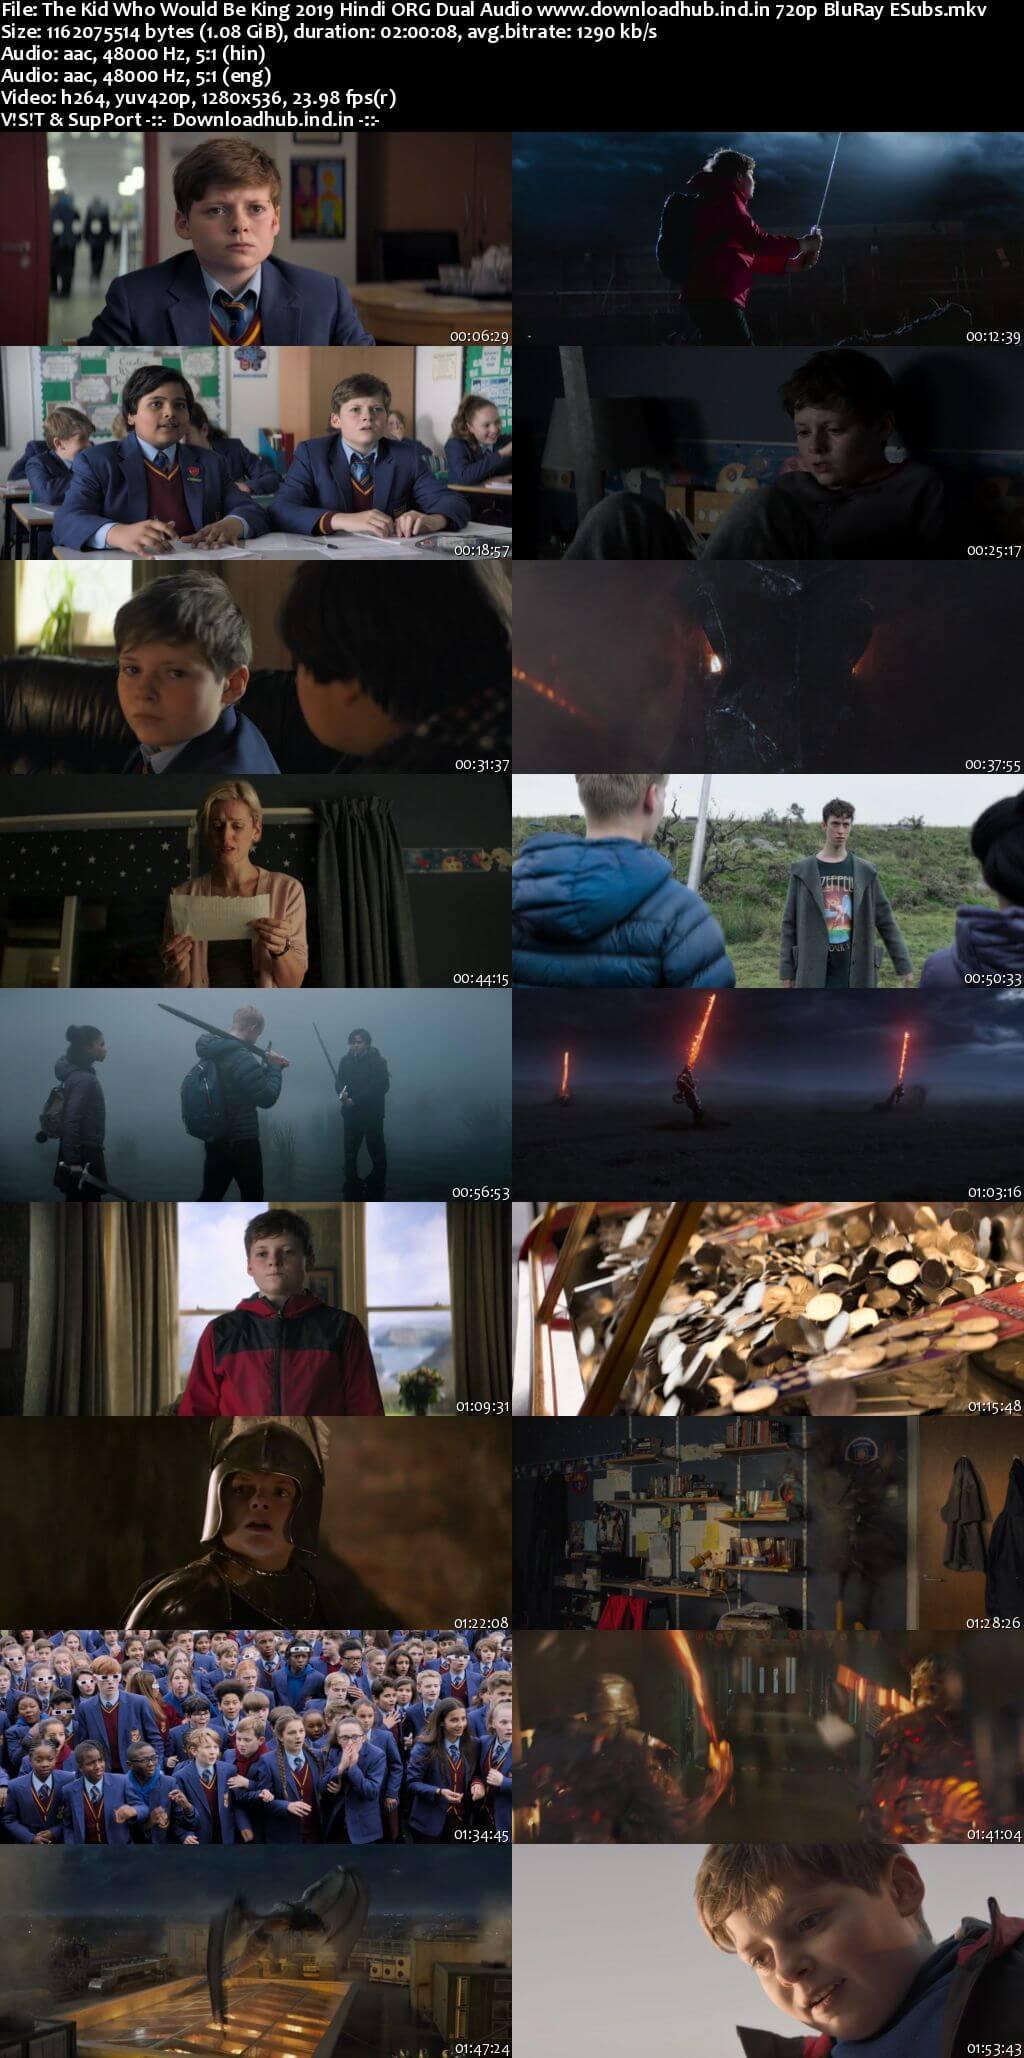 The Kid Who Would Be King 2019 Hindi ORG Dual Audio 720p BluRay ESubs